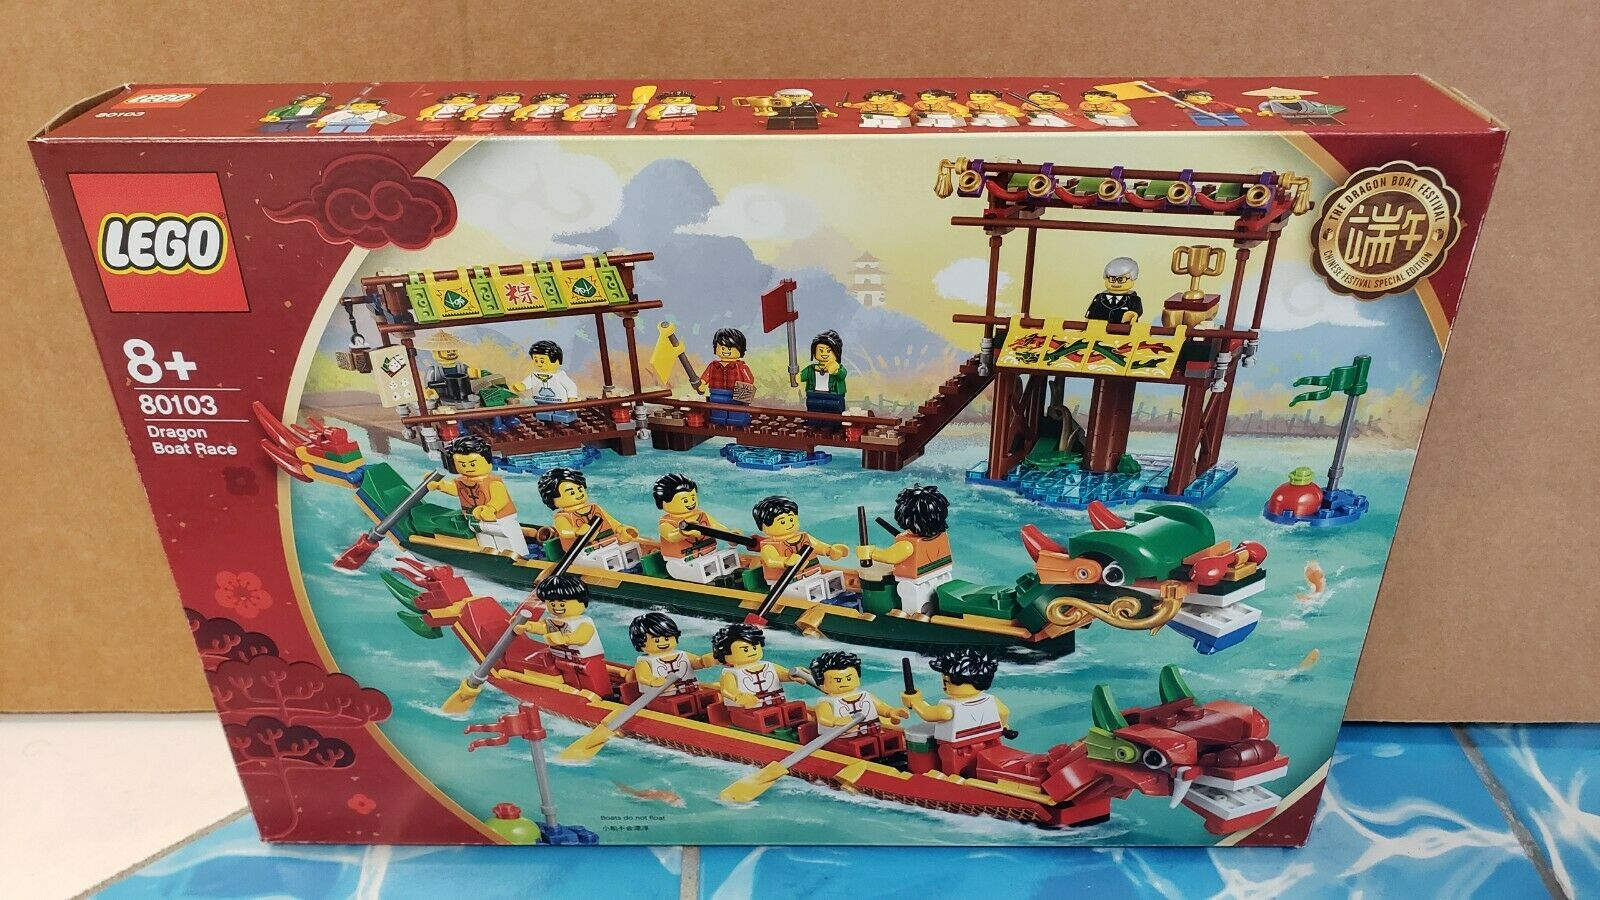 Lego 80103 Dragon Boat Race 2019 Asia exclusivo    Vendedor de Estados Unidos